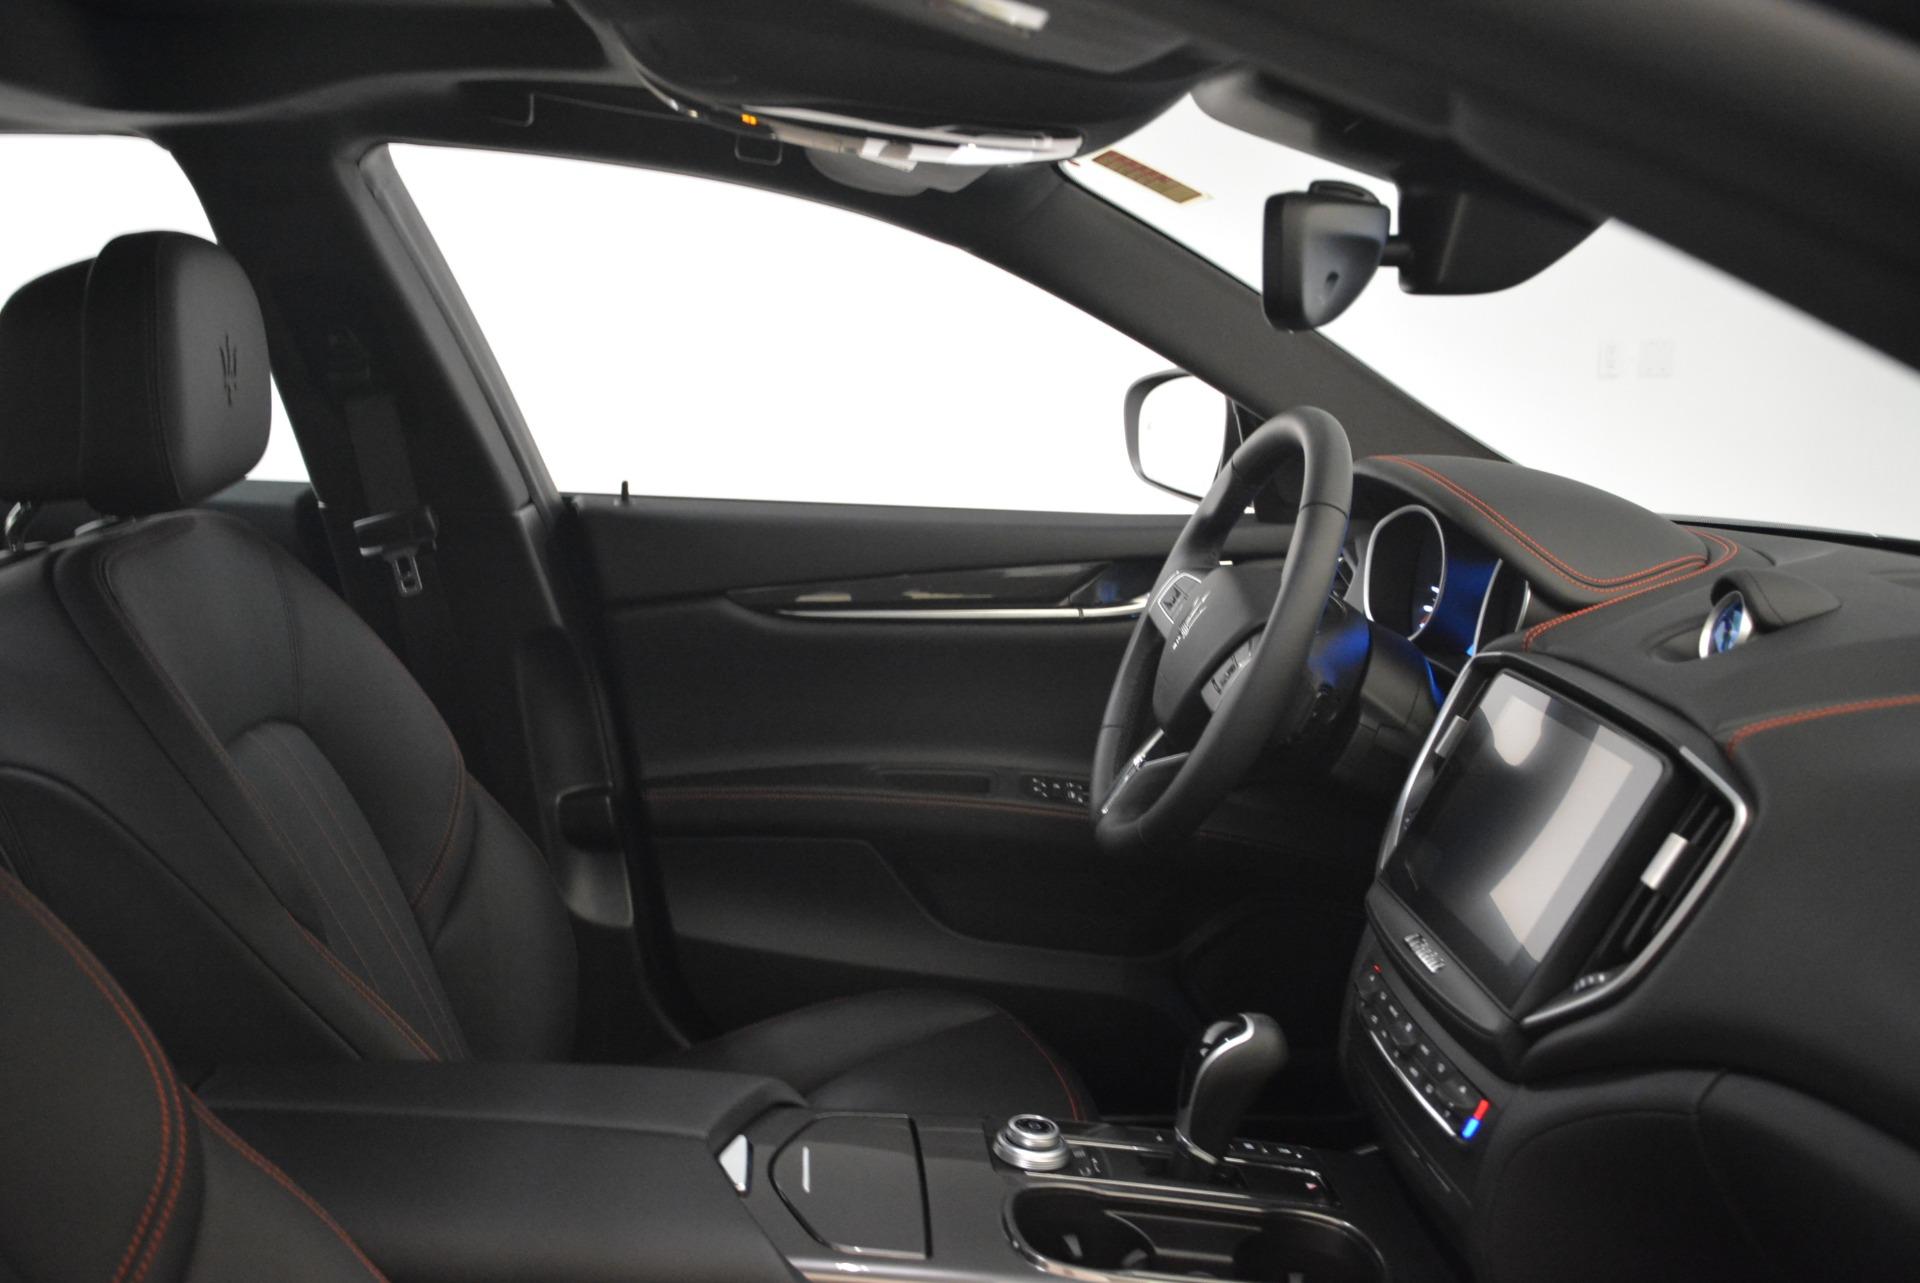 Used 2018 Maserati Ghibli S Q4 For Sale In Greenwich, CT. Alfa Romeo of Greenwich, M2143 2271_p17